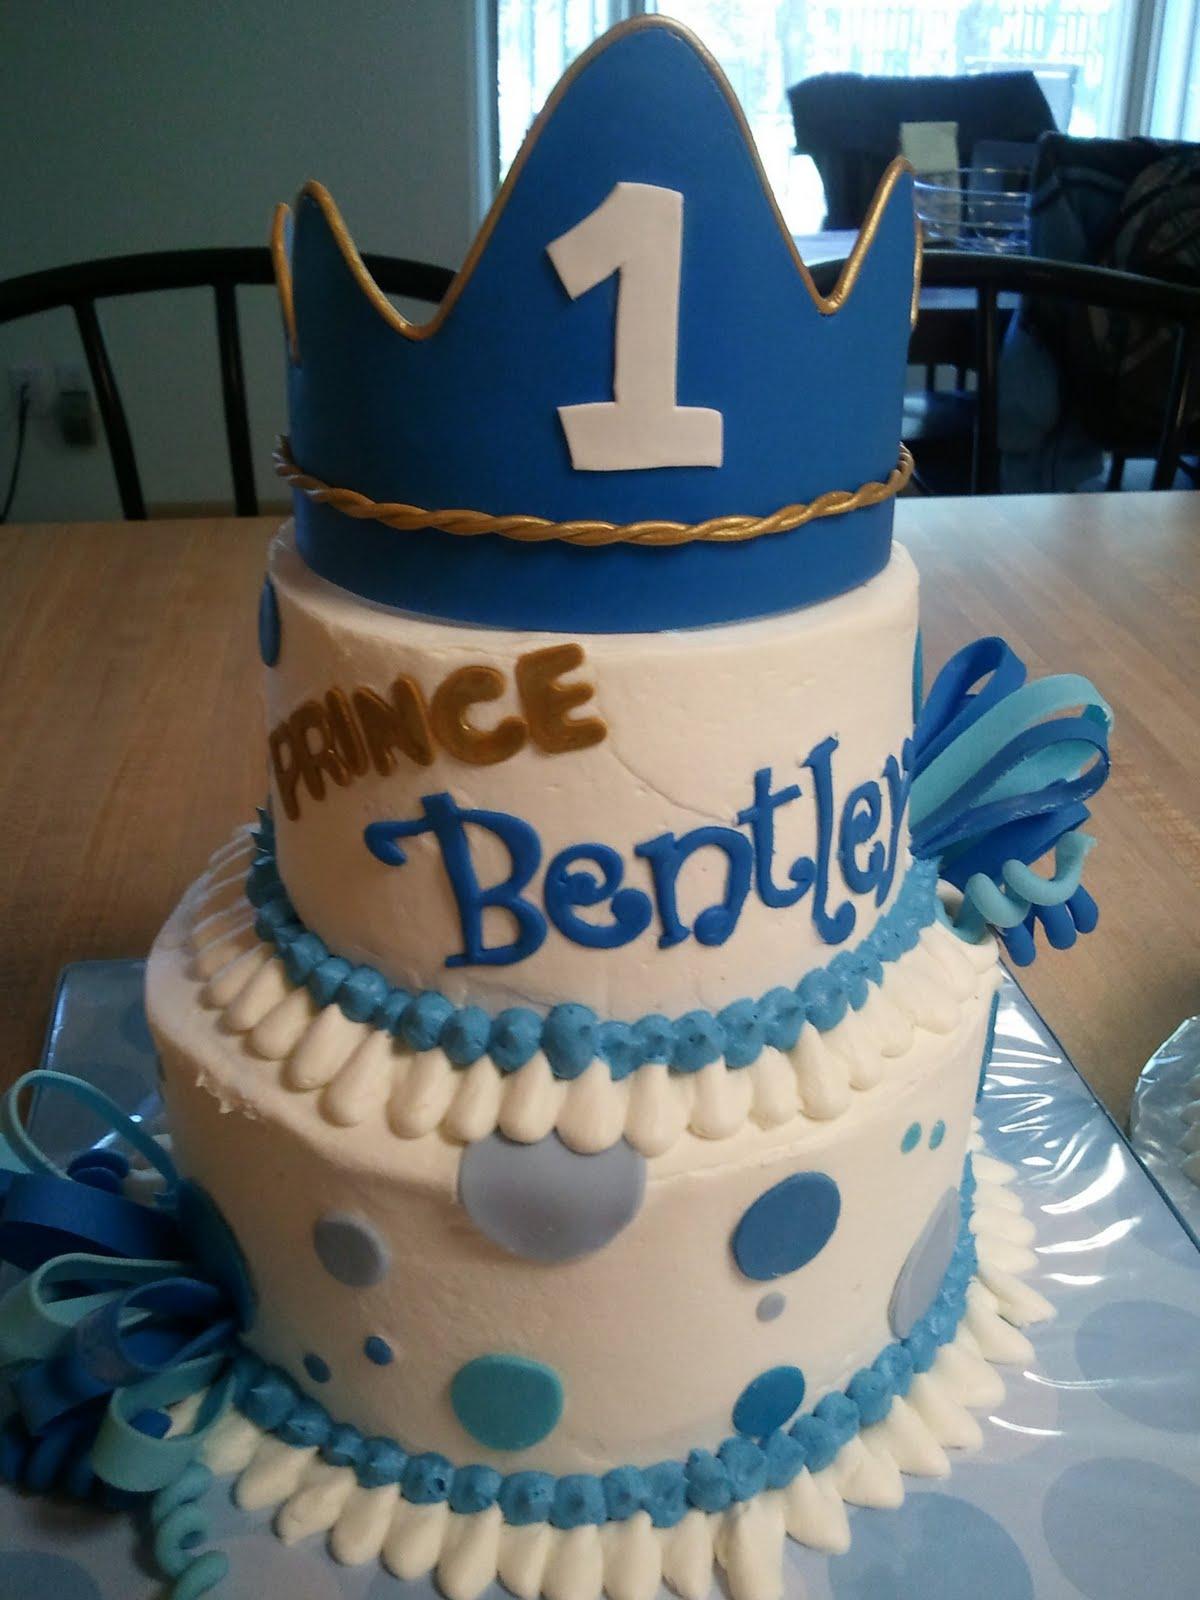 Layer Cake Bentley